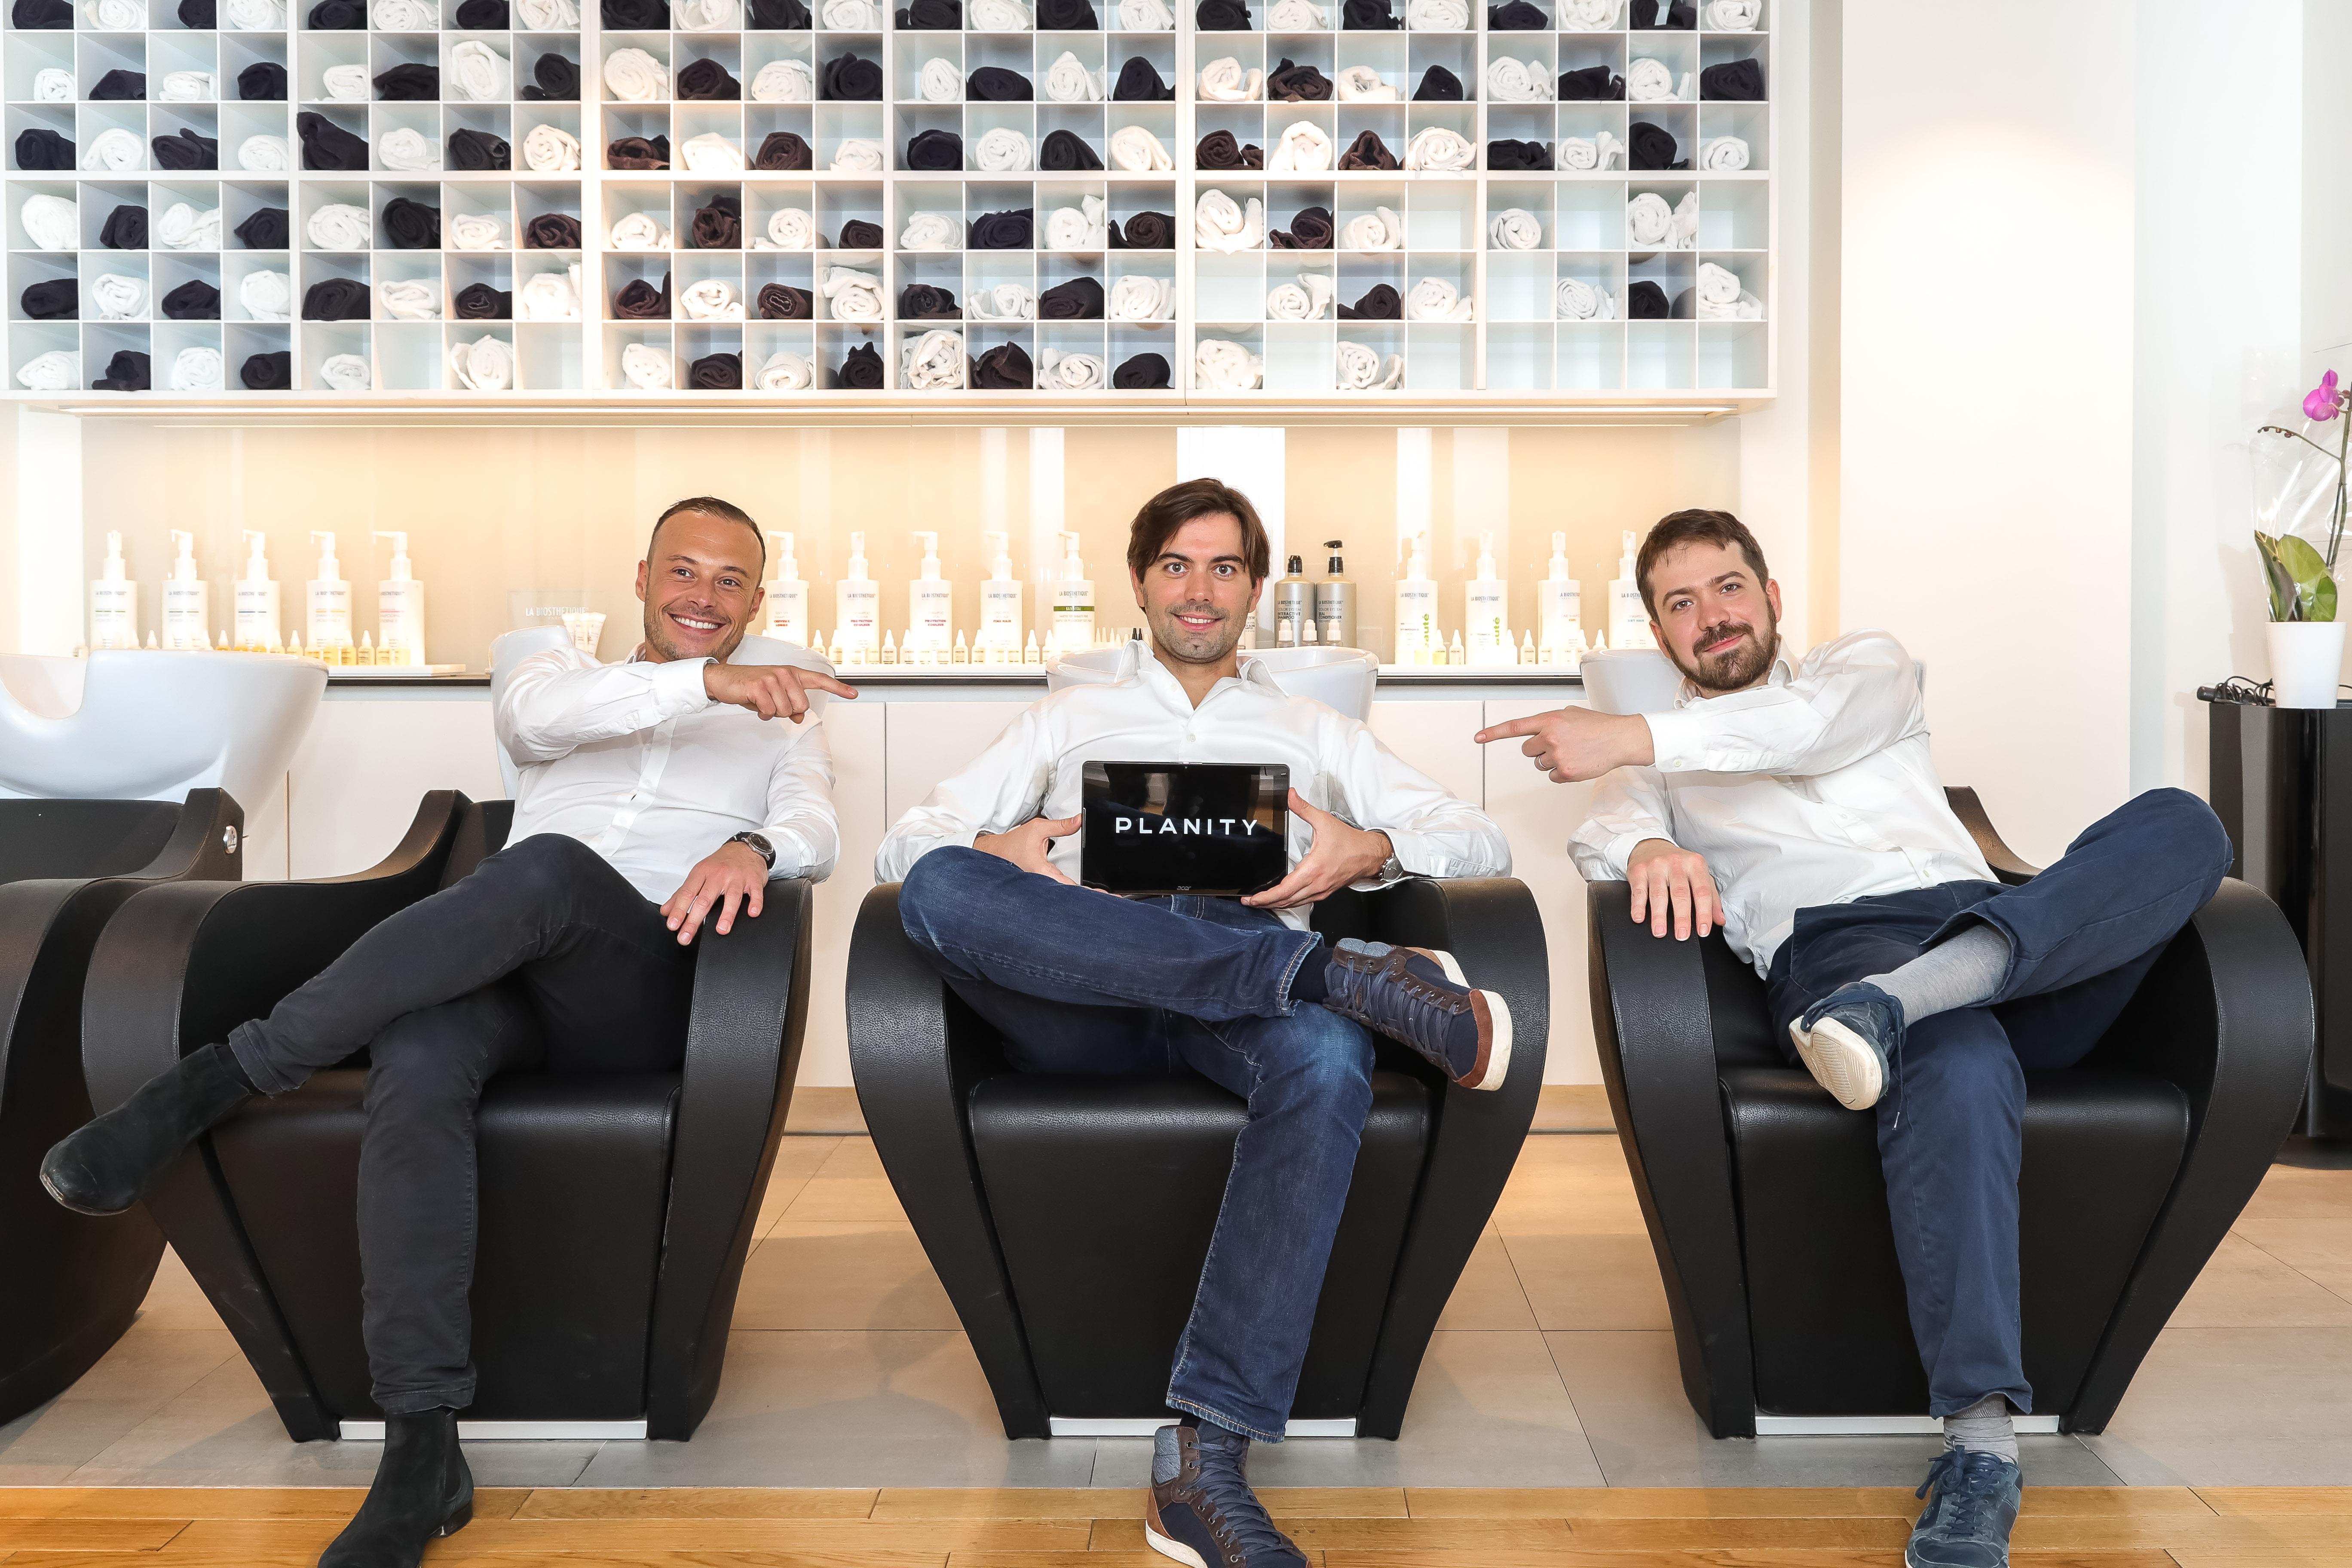 planity startup levée de fonds team